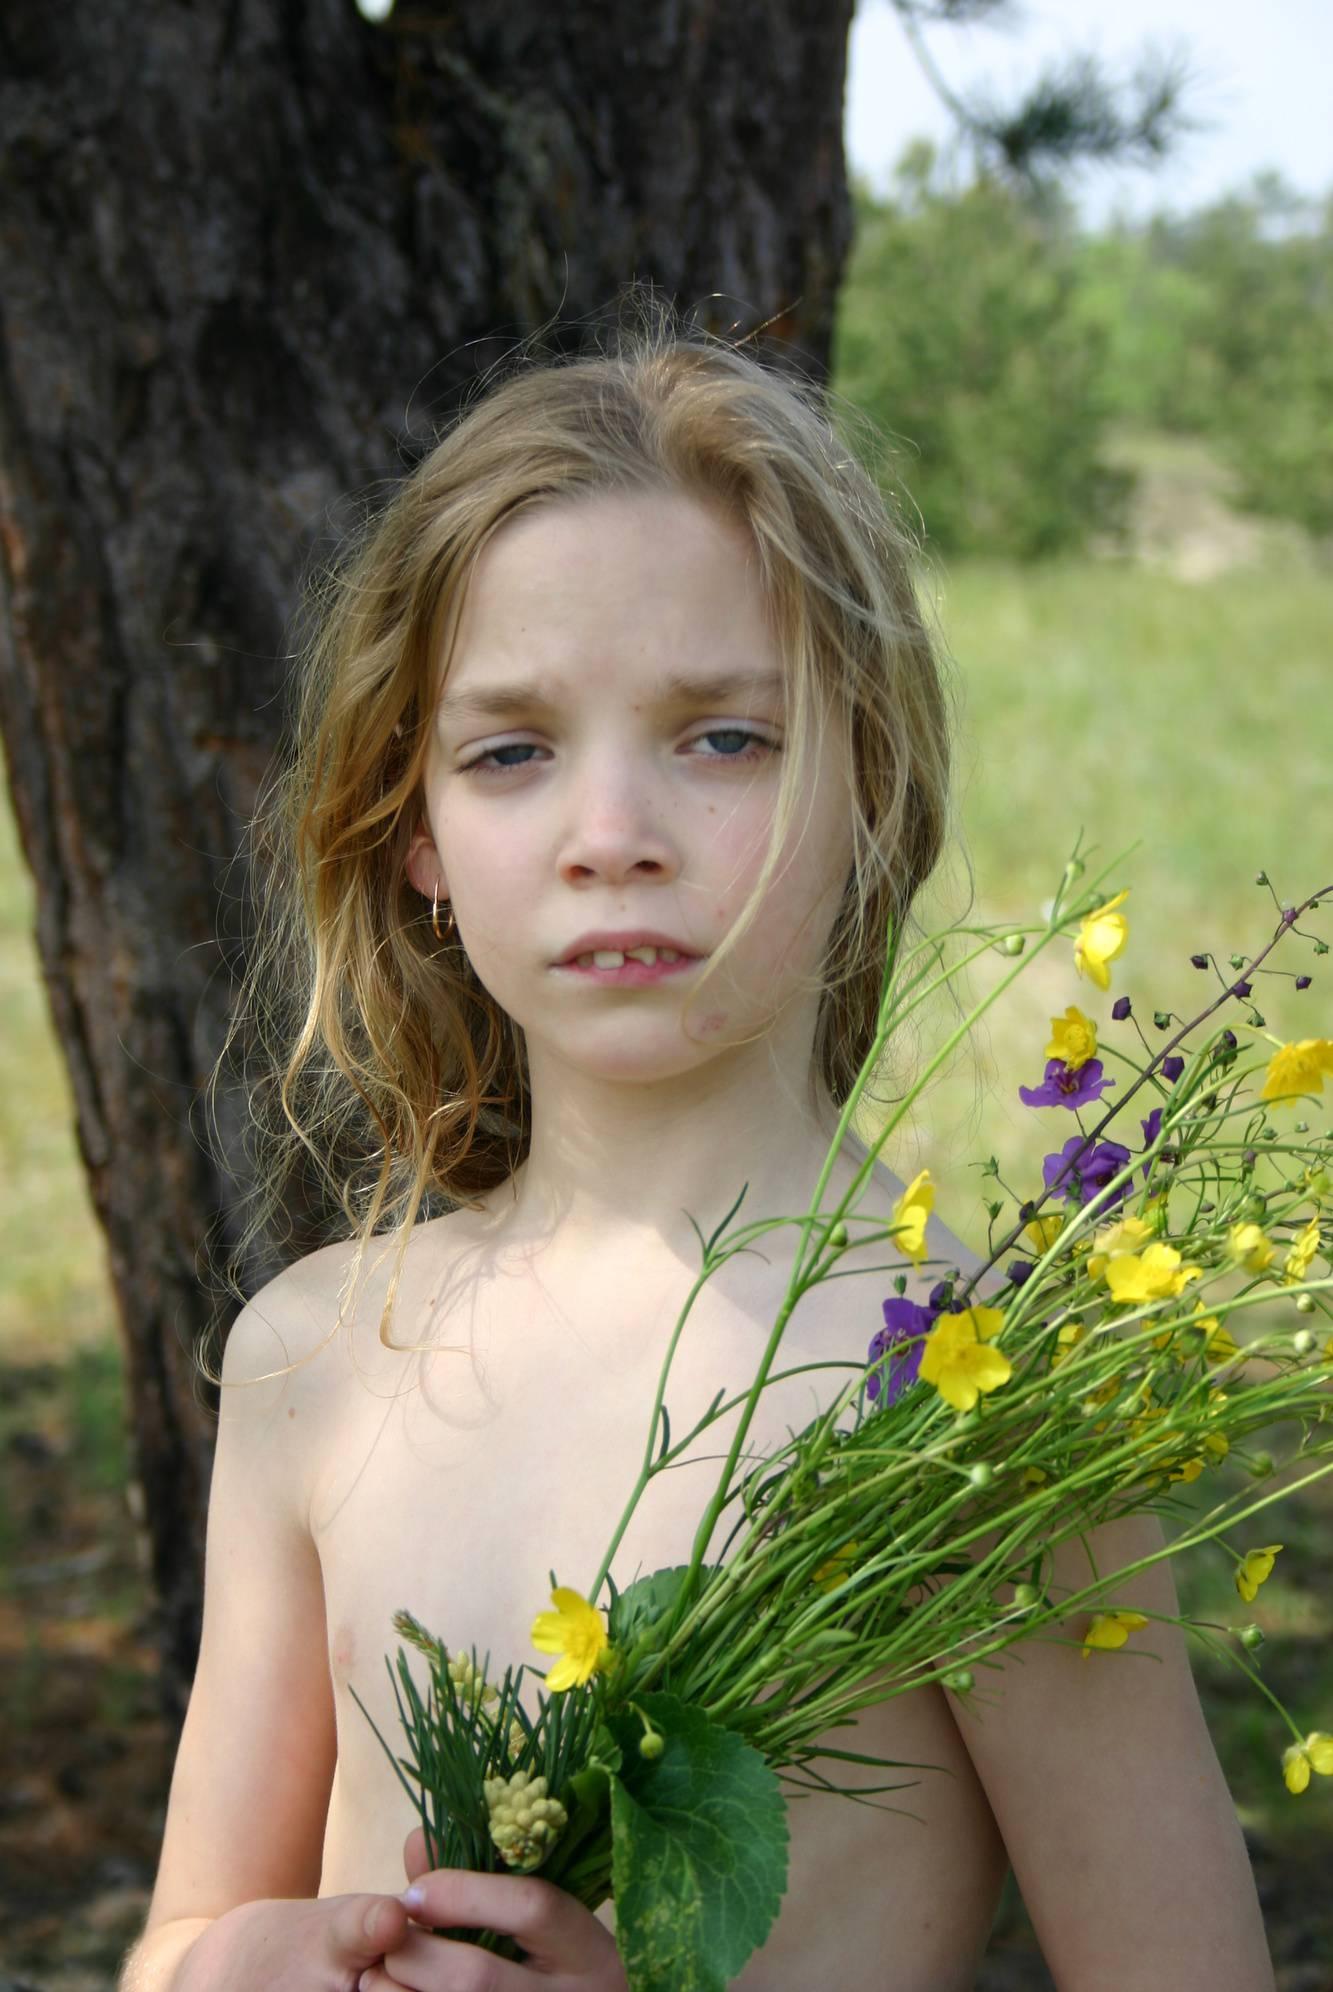 Nudist Photos Kiev In Natural Freedom - 2